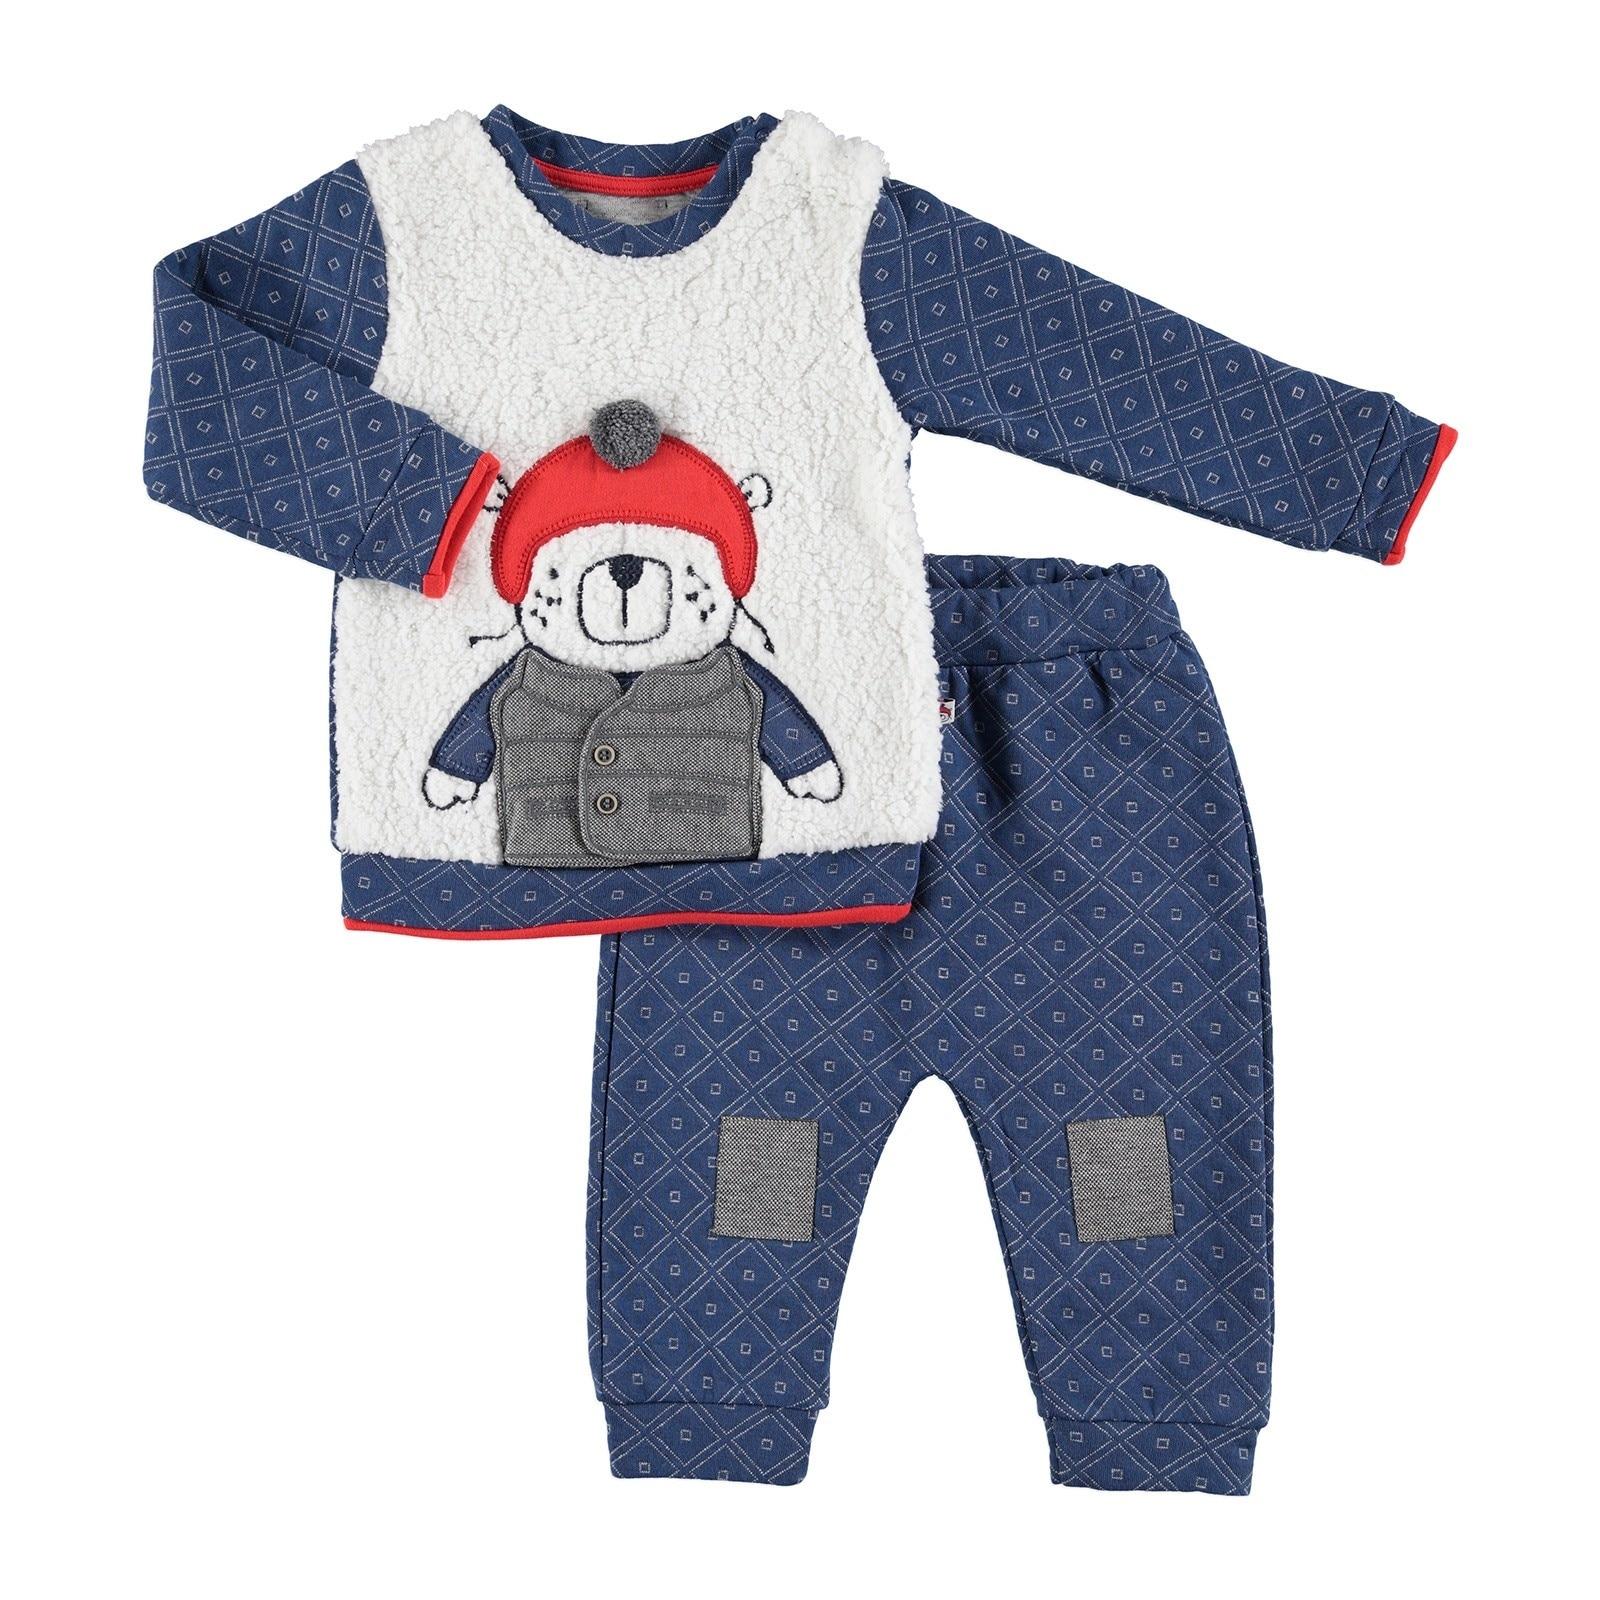 Ebebek Mymio Skateboarder Bear Baby Sweatshirt Trouser Set